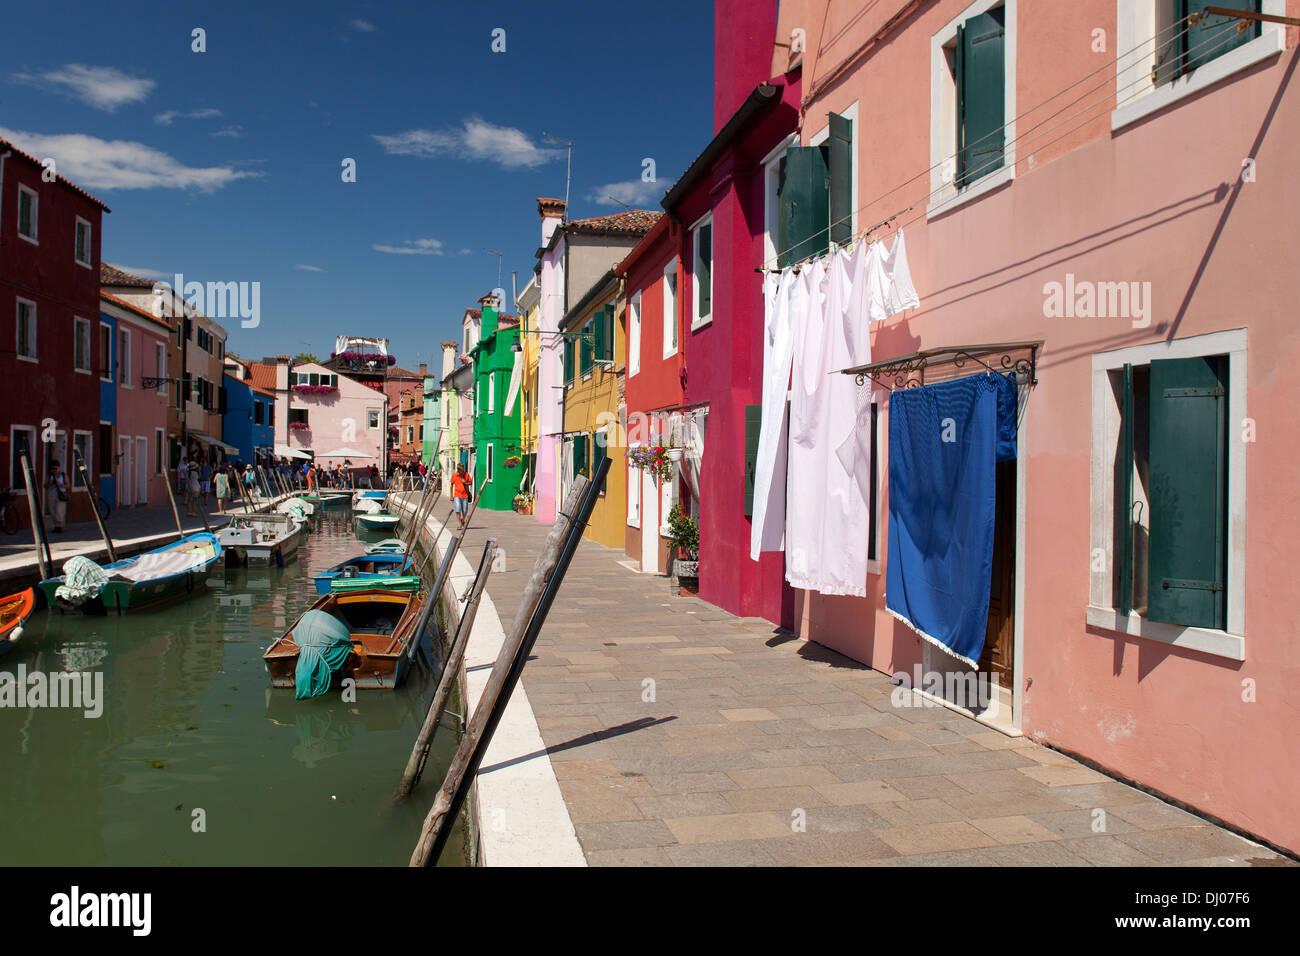 Burano, Venice - Colourful houses on Burano, Venice, Italy - Stock Image